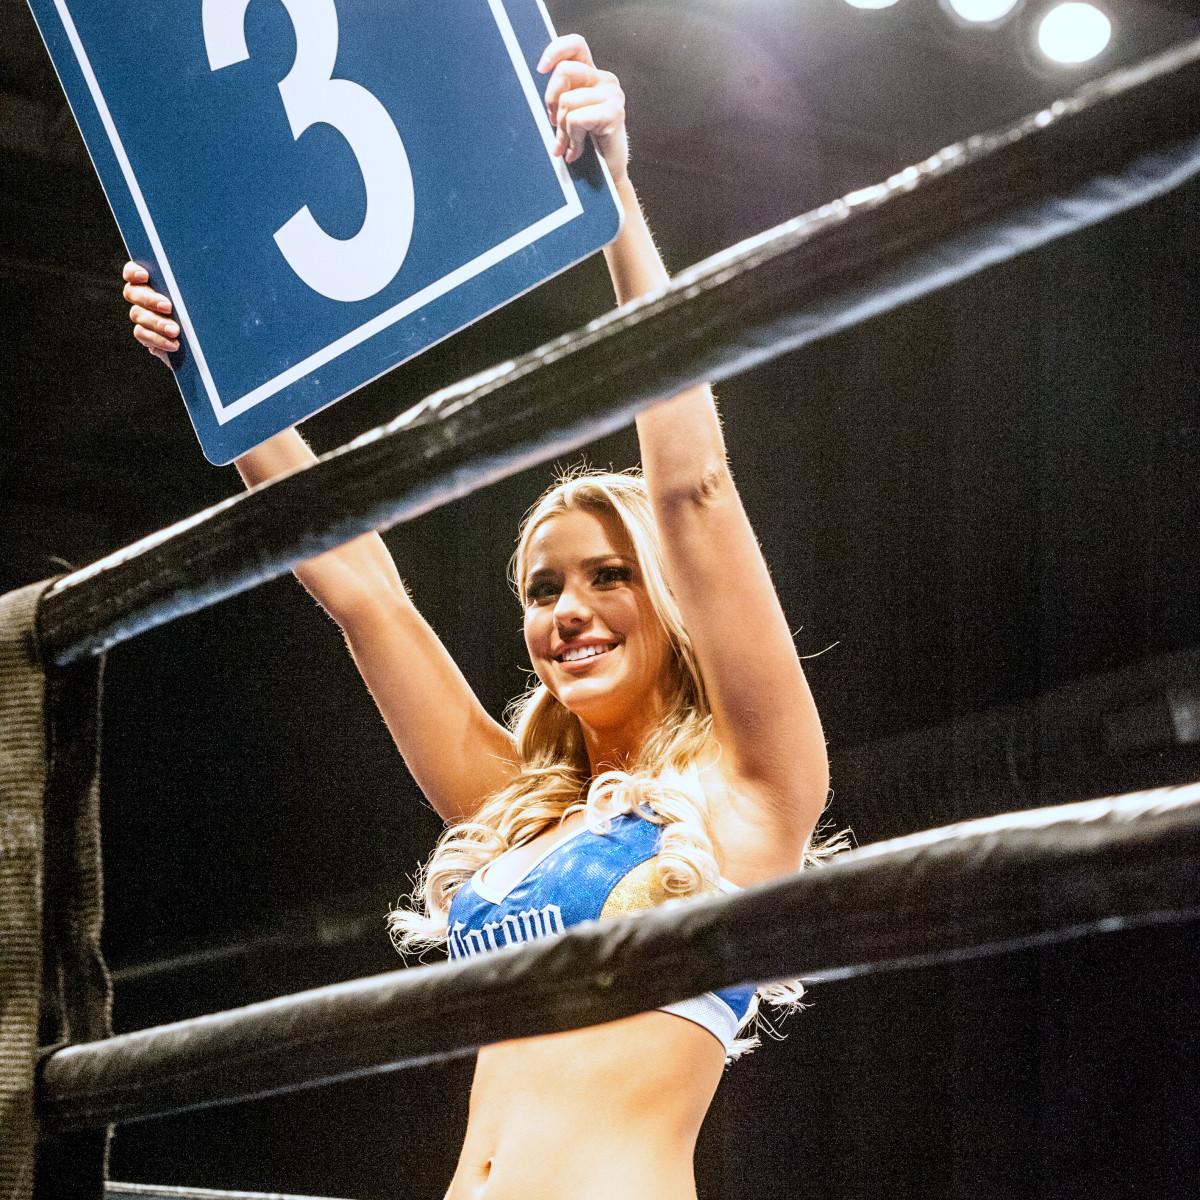 Houston, Black Tie Boxing Benefiting Lone Survivor Foundation, Feb 2017, the ring girl